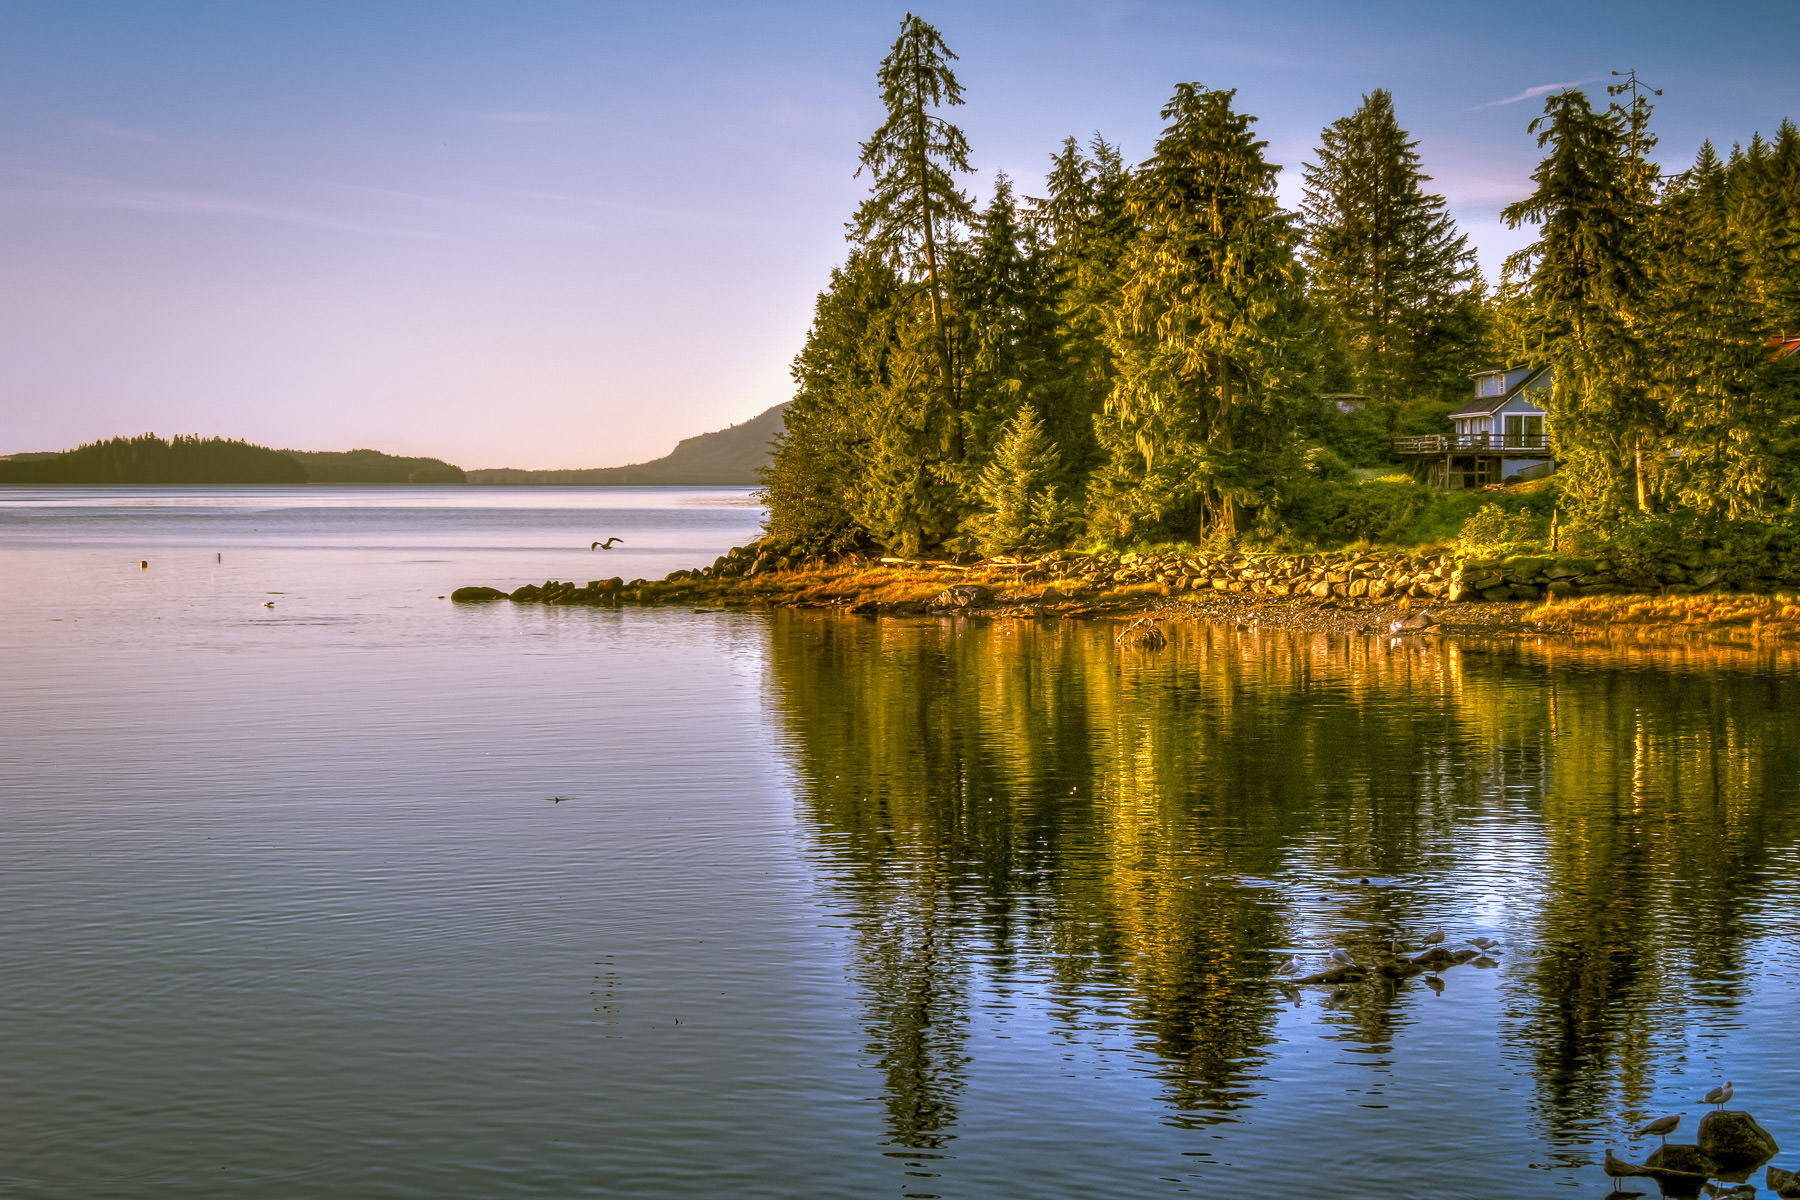 The morning sun begins to illuminate the shoreline of Herring Cove, just outside of Ketchikan, Alaska.